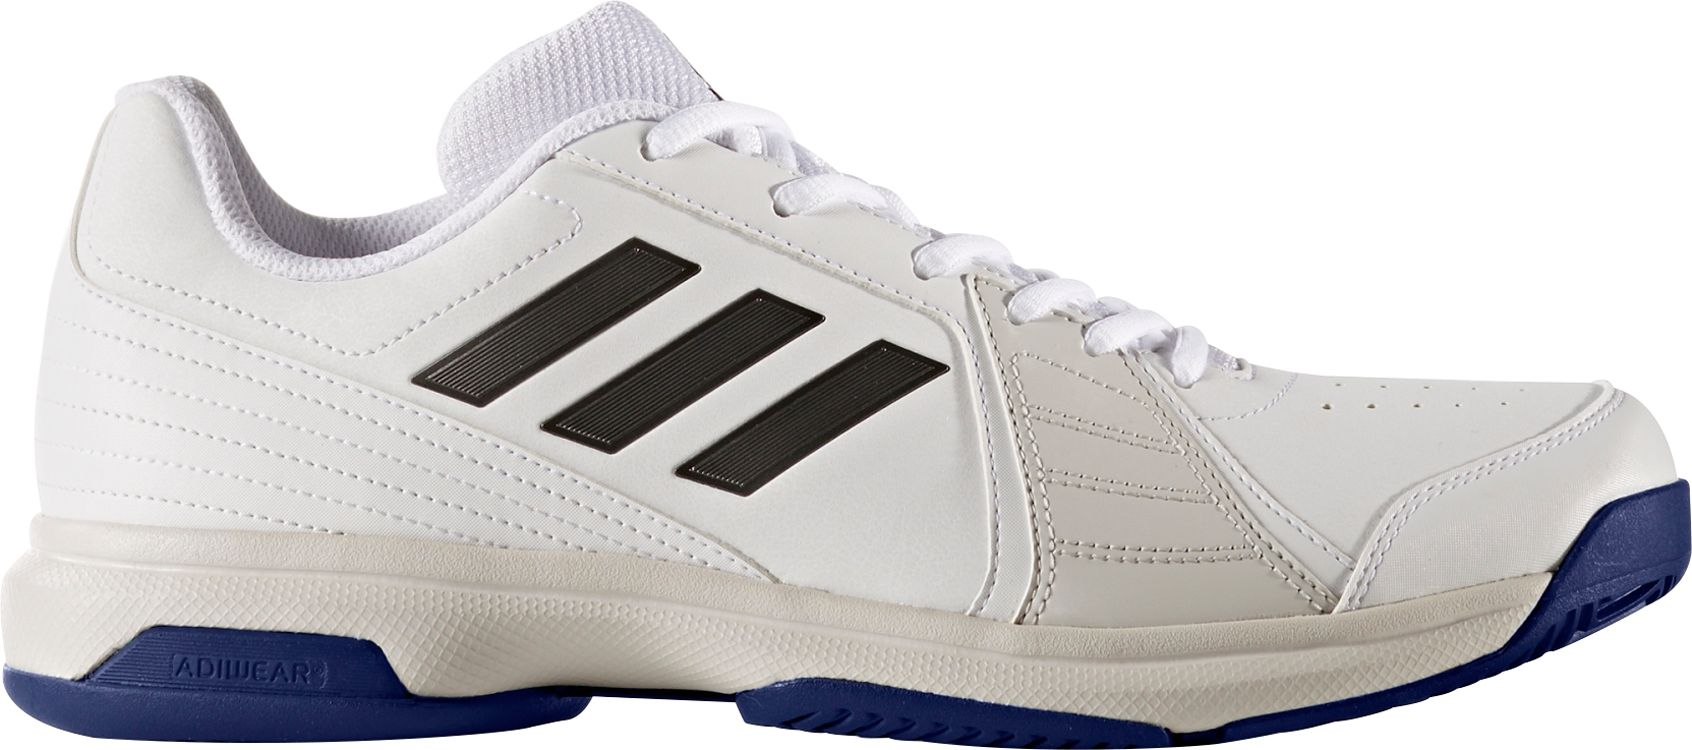 mens tennis shoes size 10 wide style guru fashion